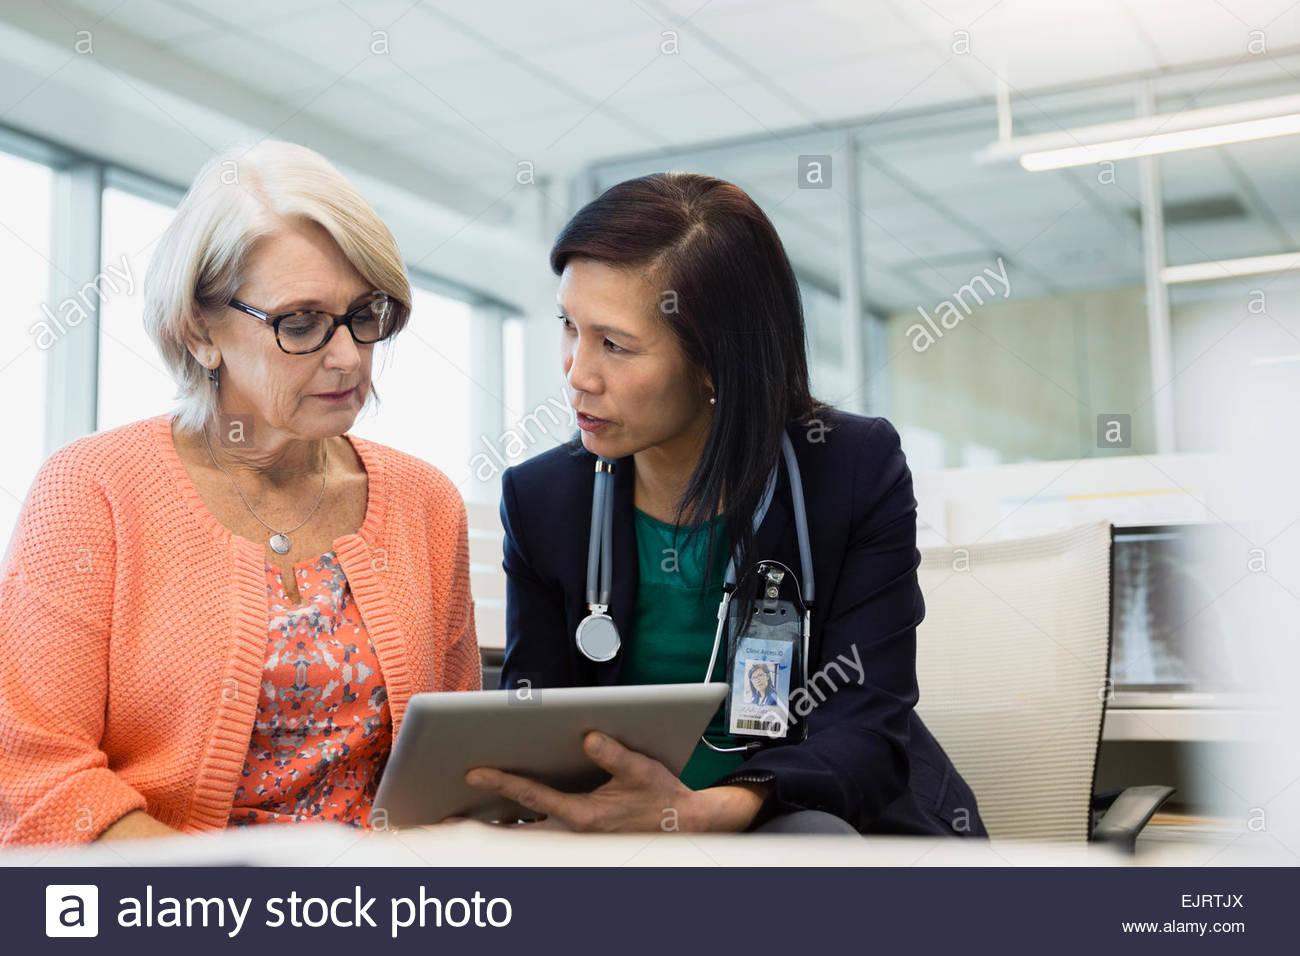 Médecin et patient using digital tablet in clinic Photo Stock